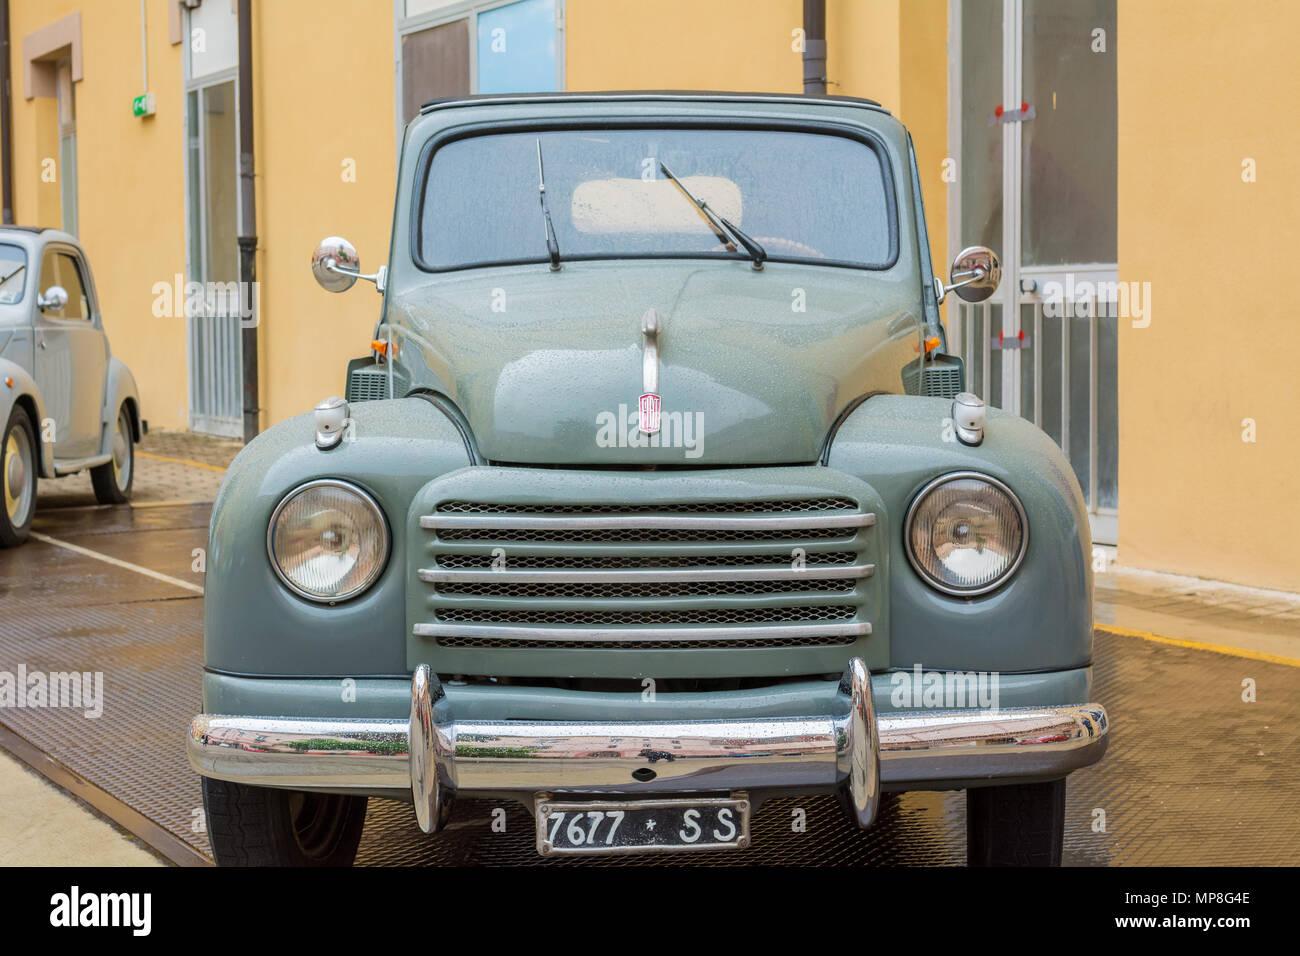 FIAT 500 C 'Topolino' (1950) -  a classic vintage italian car, Cagliari, Sardinia, Italy - Stock Image